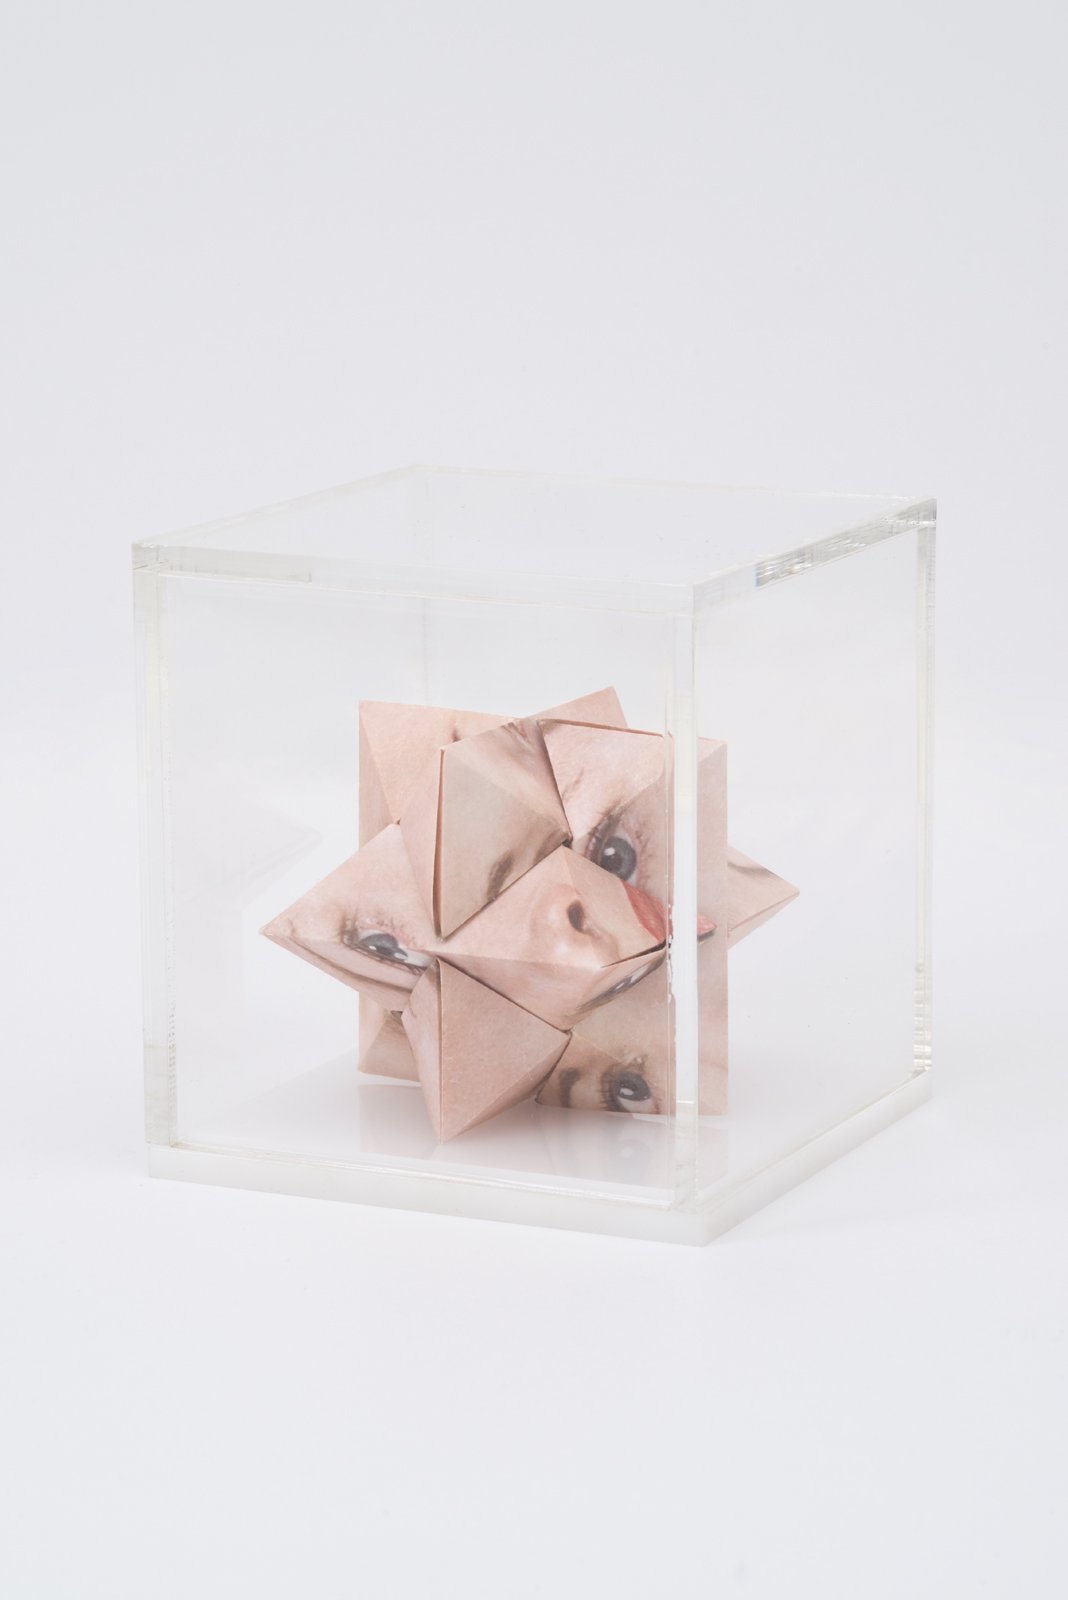 Alma Haser,  Prototype No. 26 (Carla) , 2016  Digital pigment print with folded digital pigment print sculpture, plexiglass box, 12 x 12 x 12 cm (approx. 5 x 5 x 5 in), edition of 5   Inquire